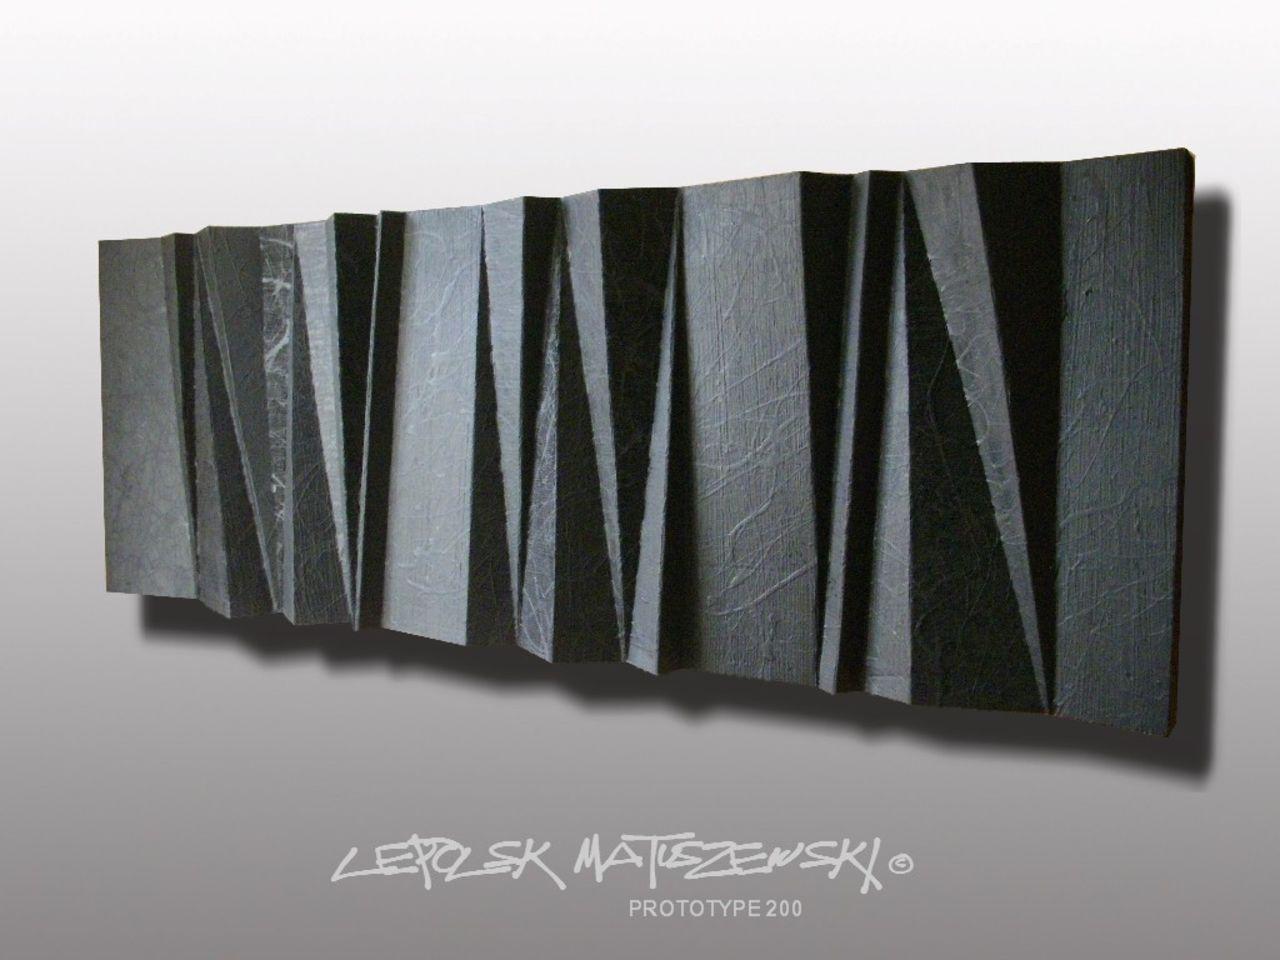 MK  Lepolsk Matuszewski PROTOTYPE 200  expressionnisme abstrait